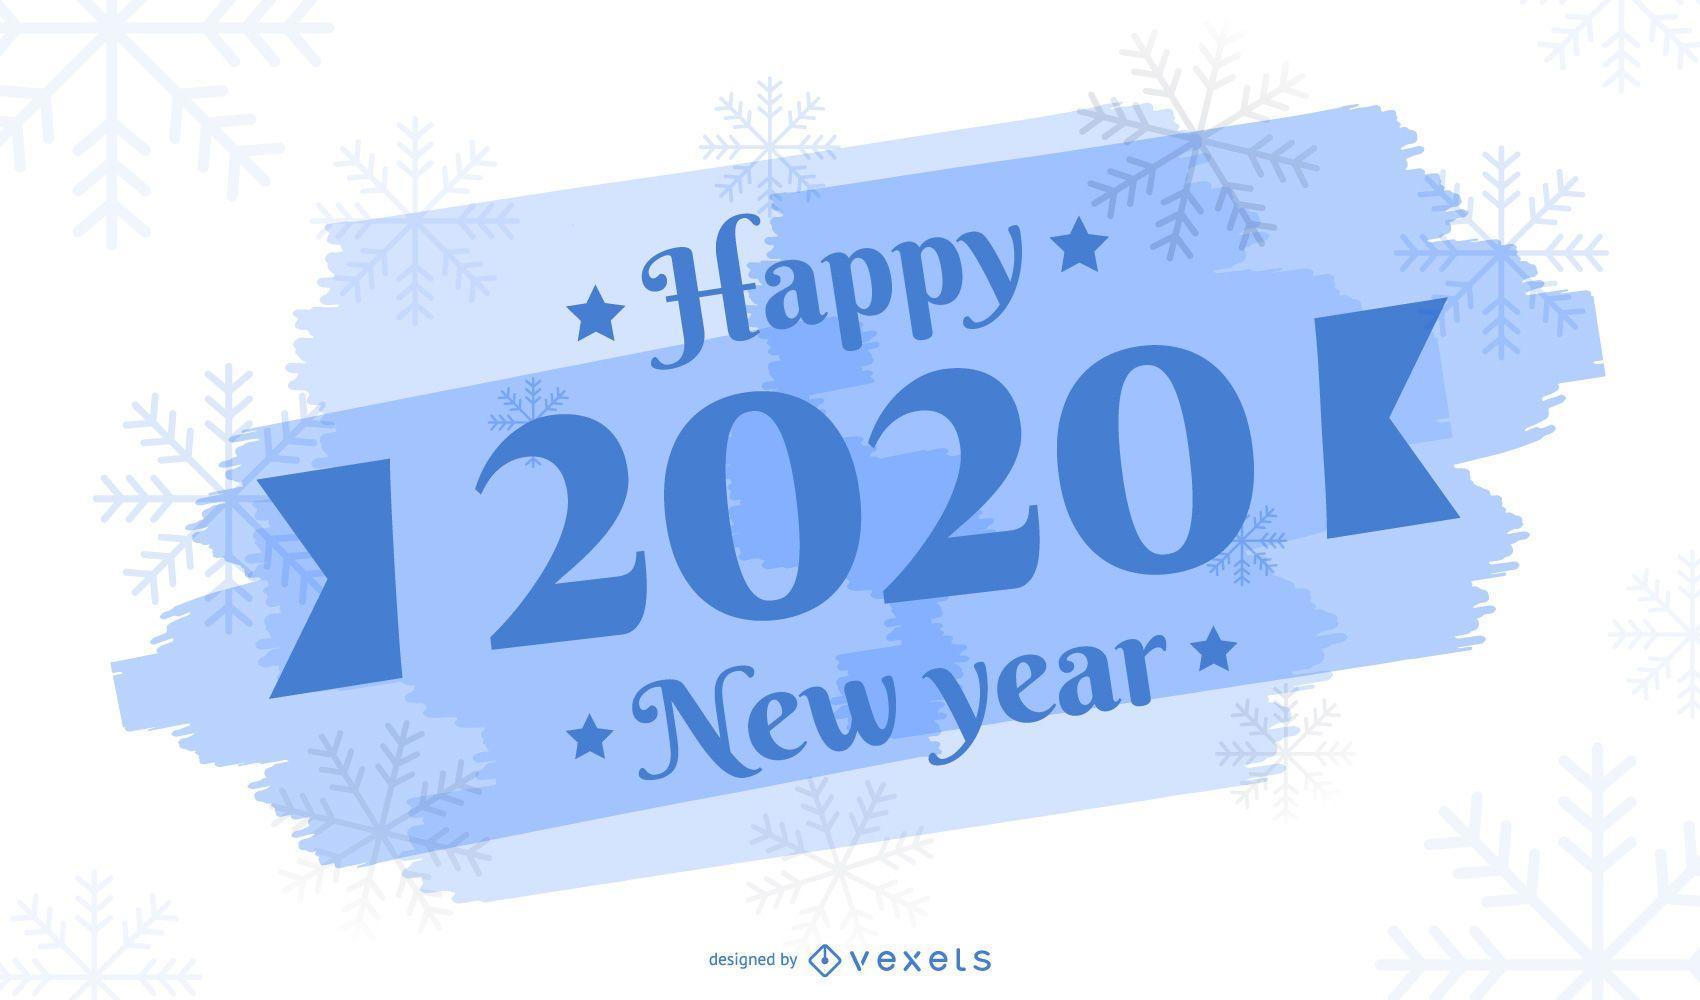 2020 New Year Greeting